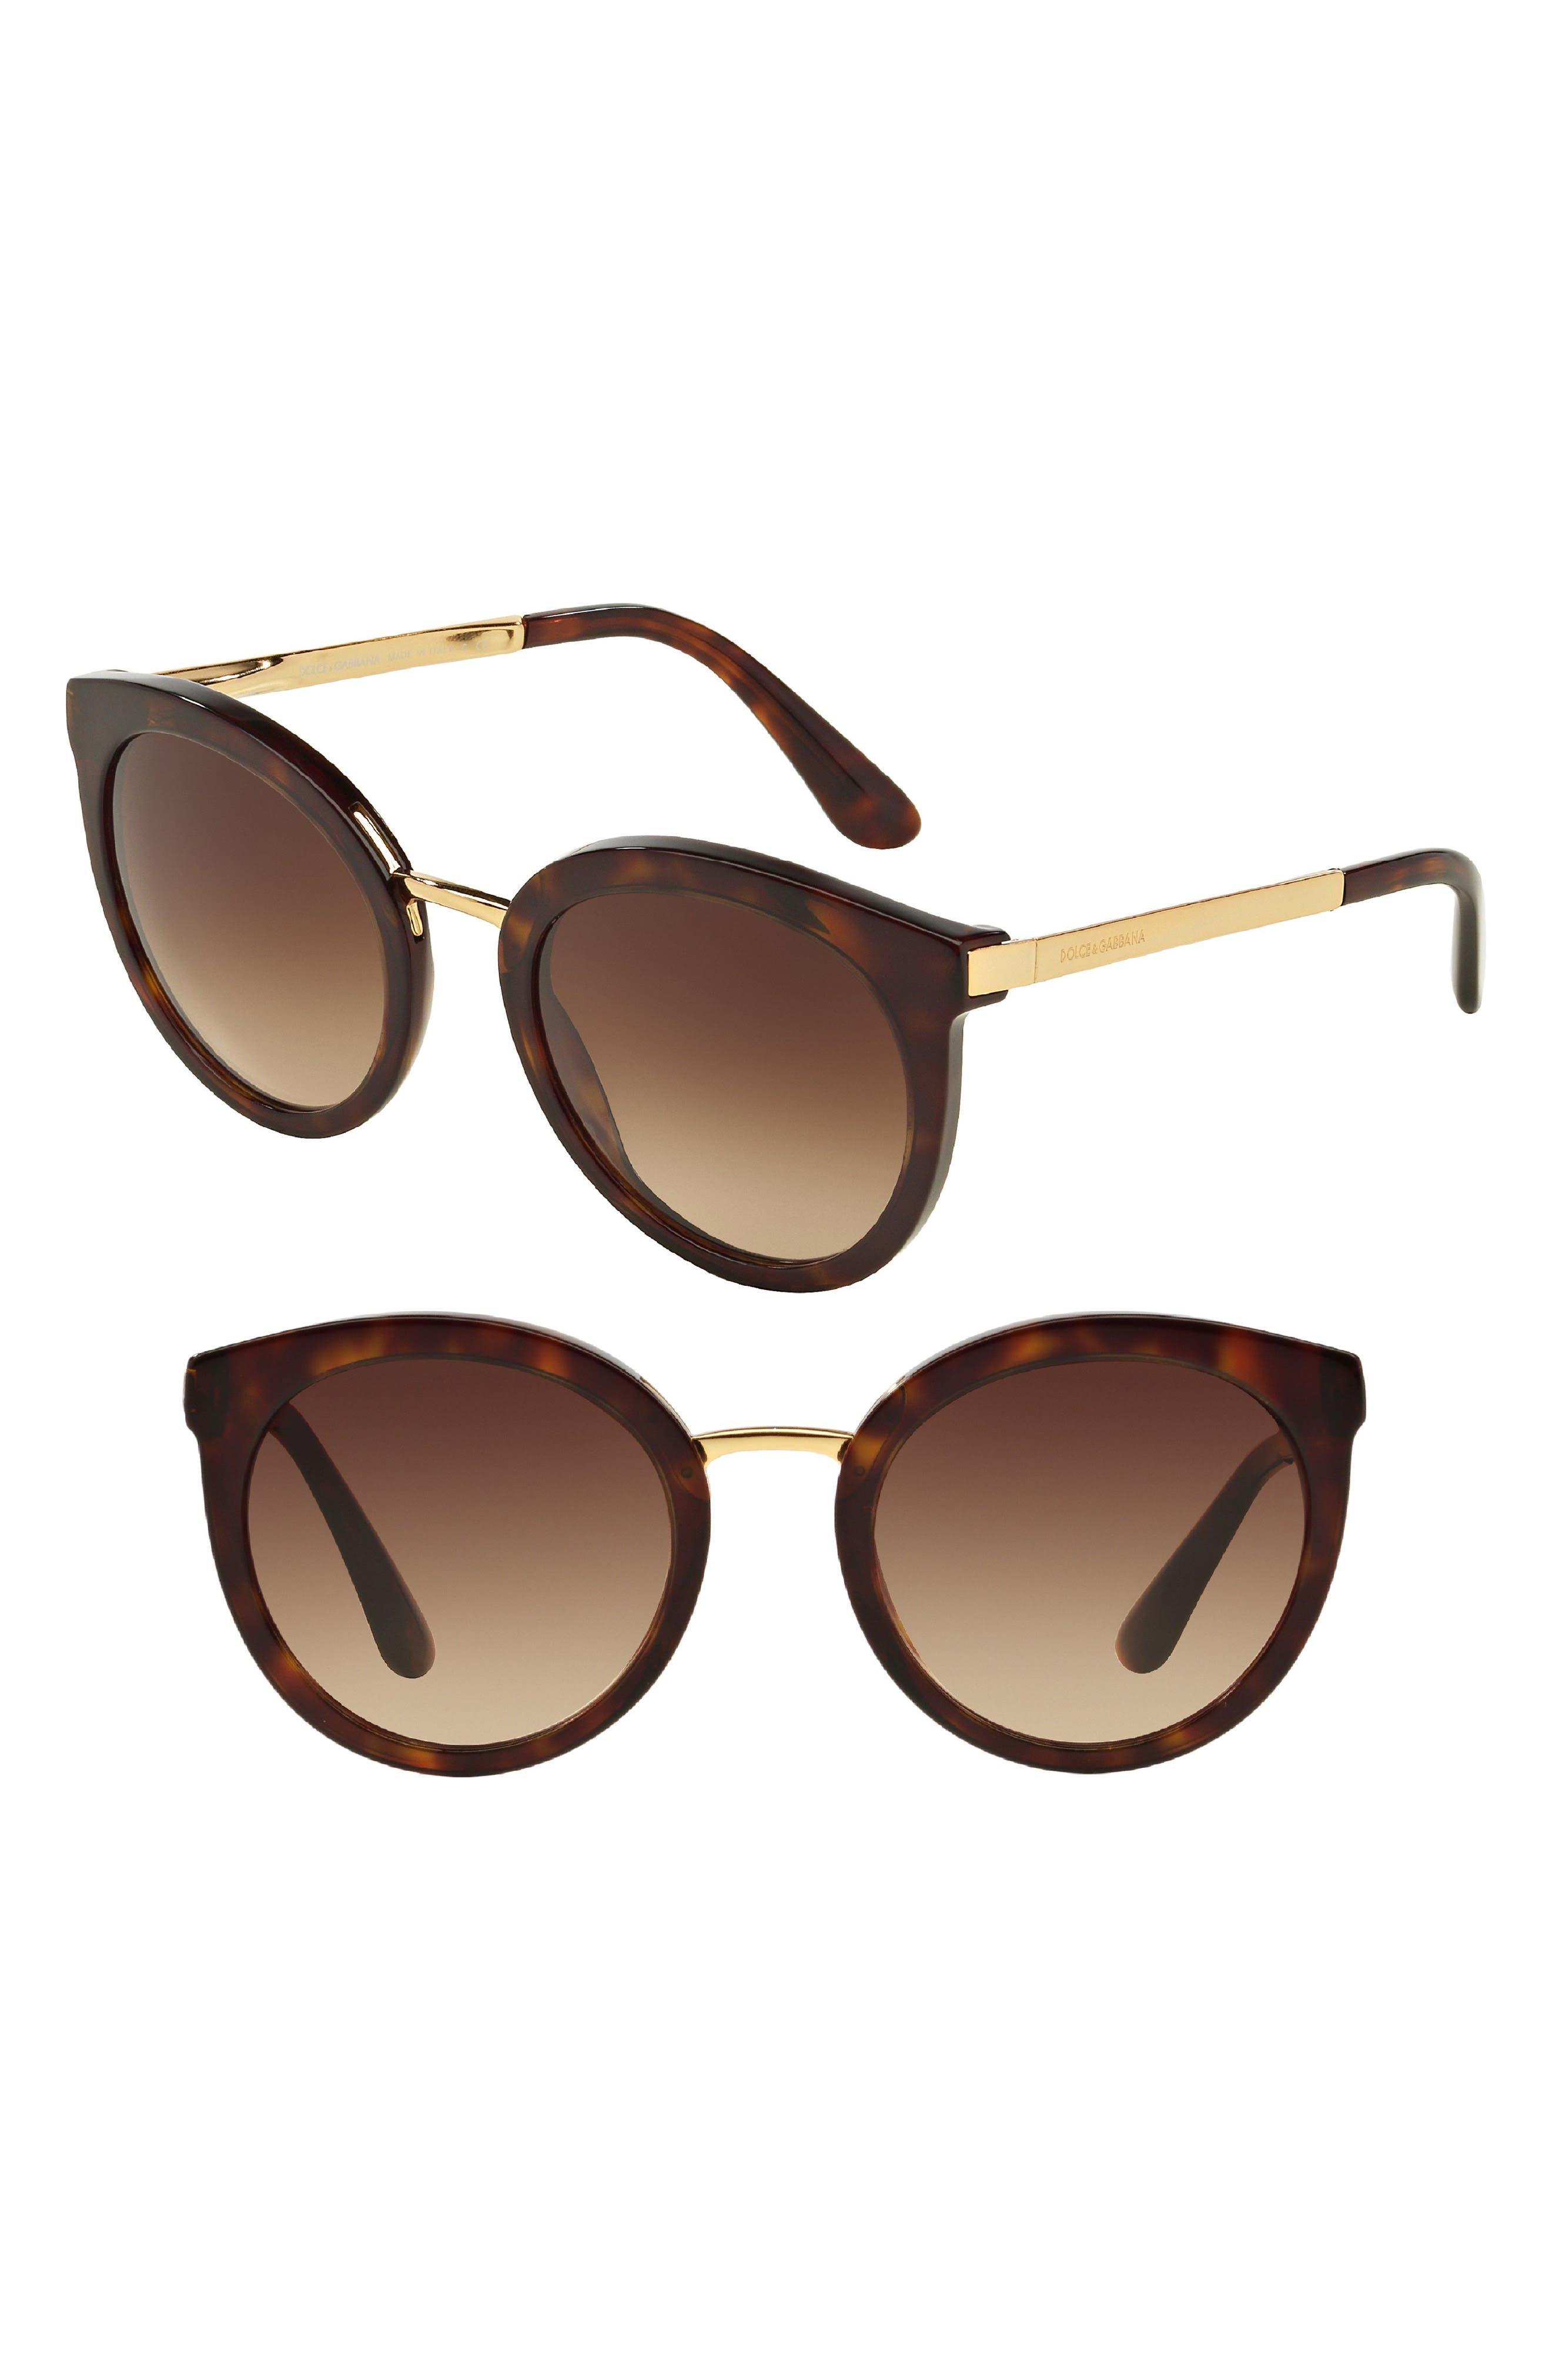 52mm Round Sunglasses,                         Main,                         color, Havana